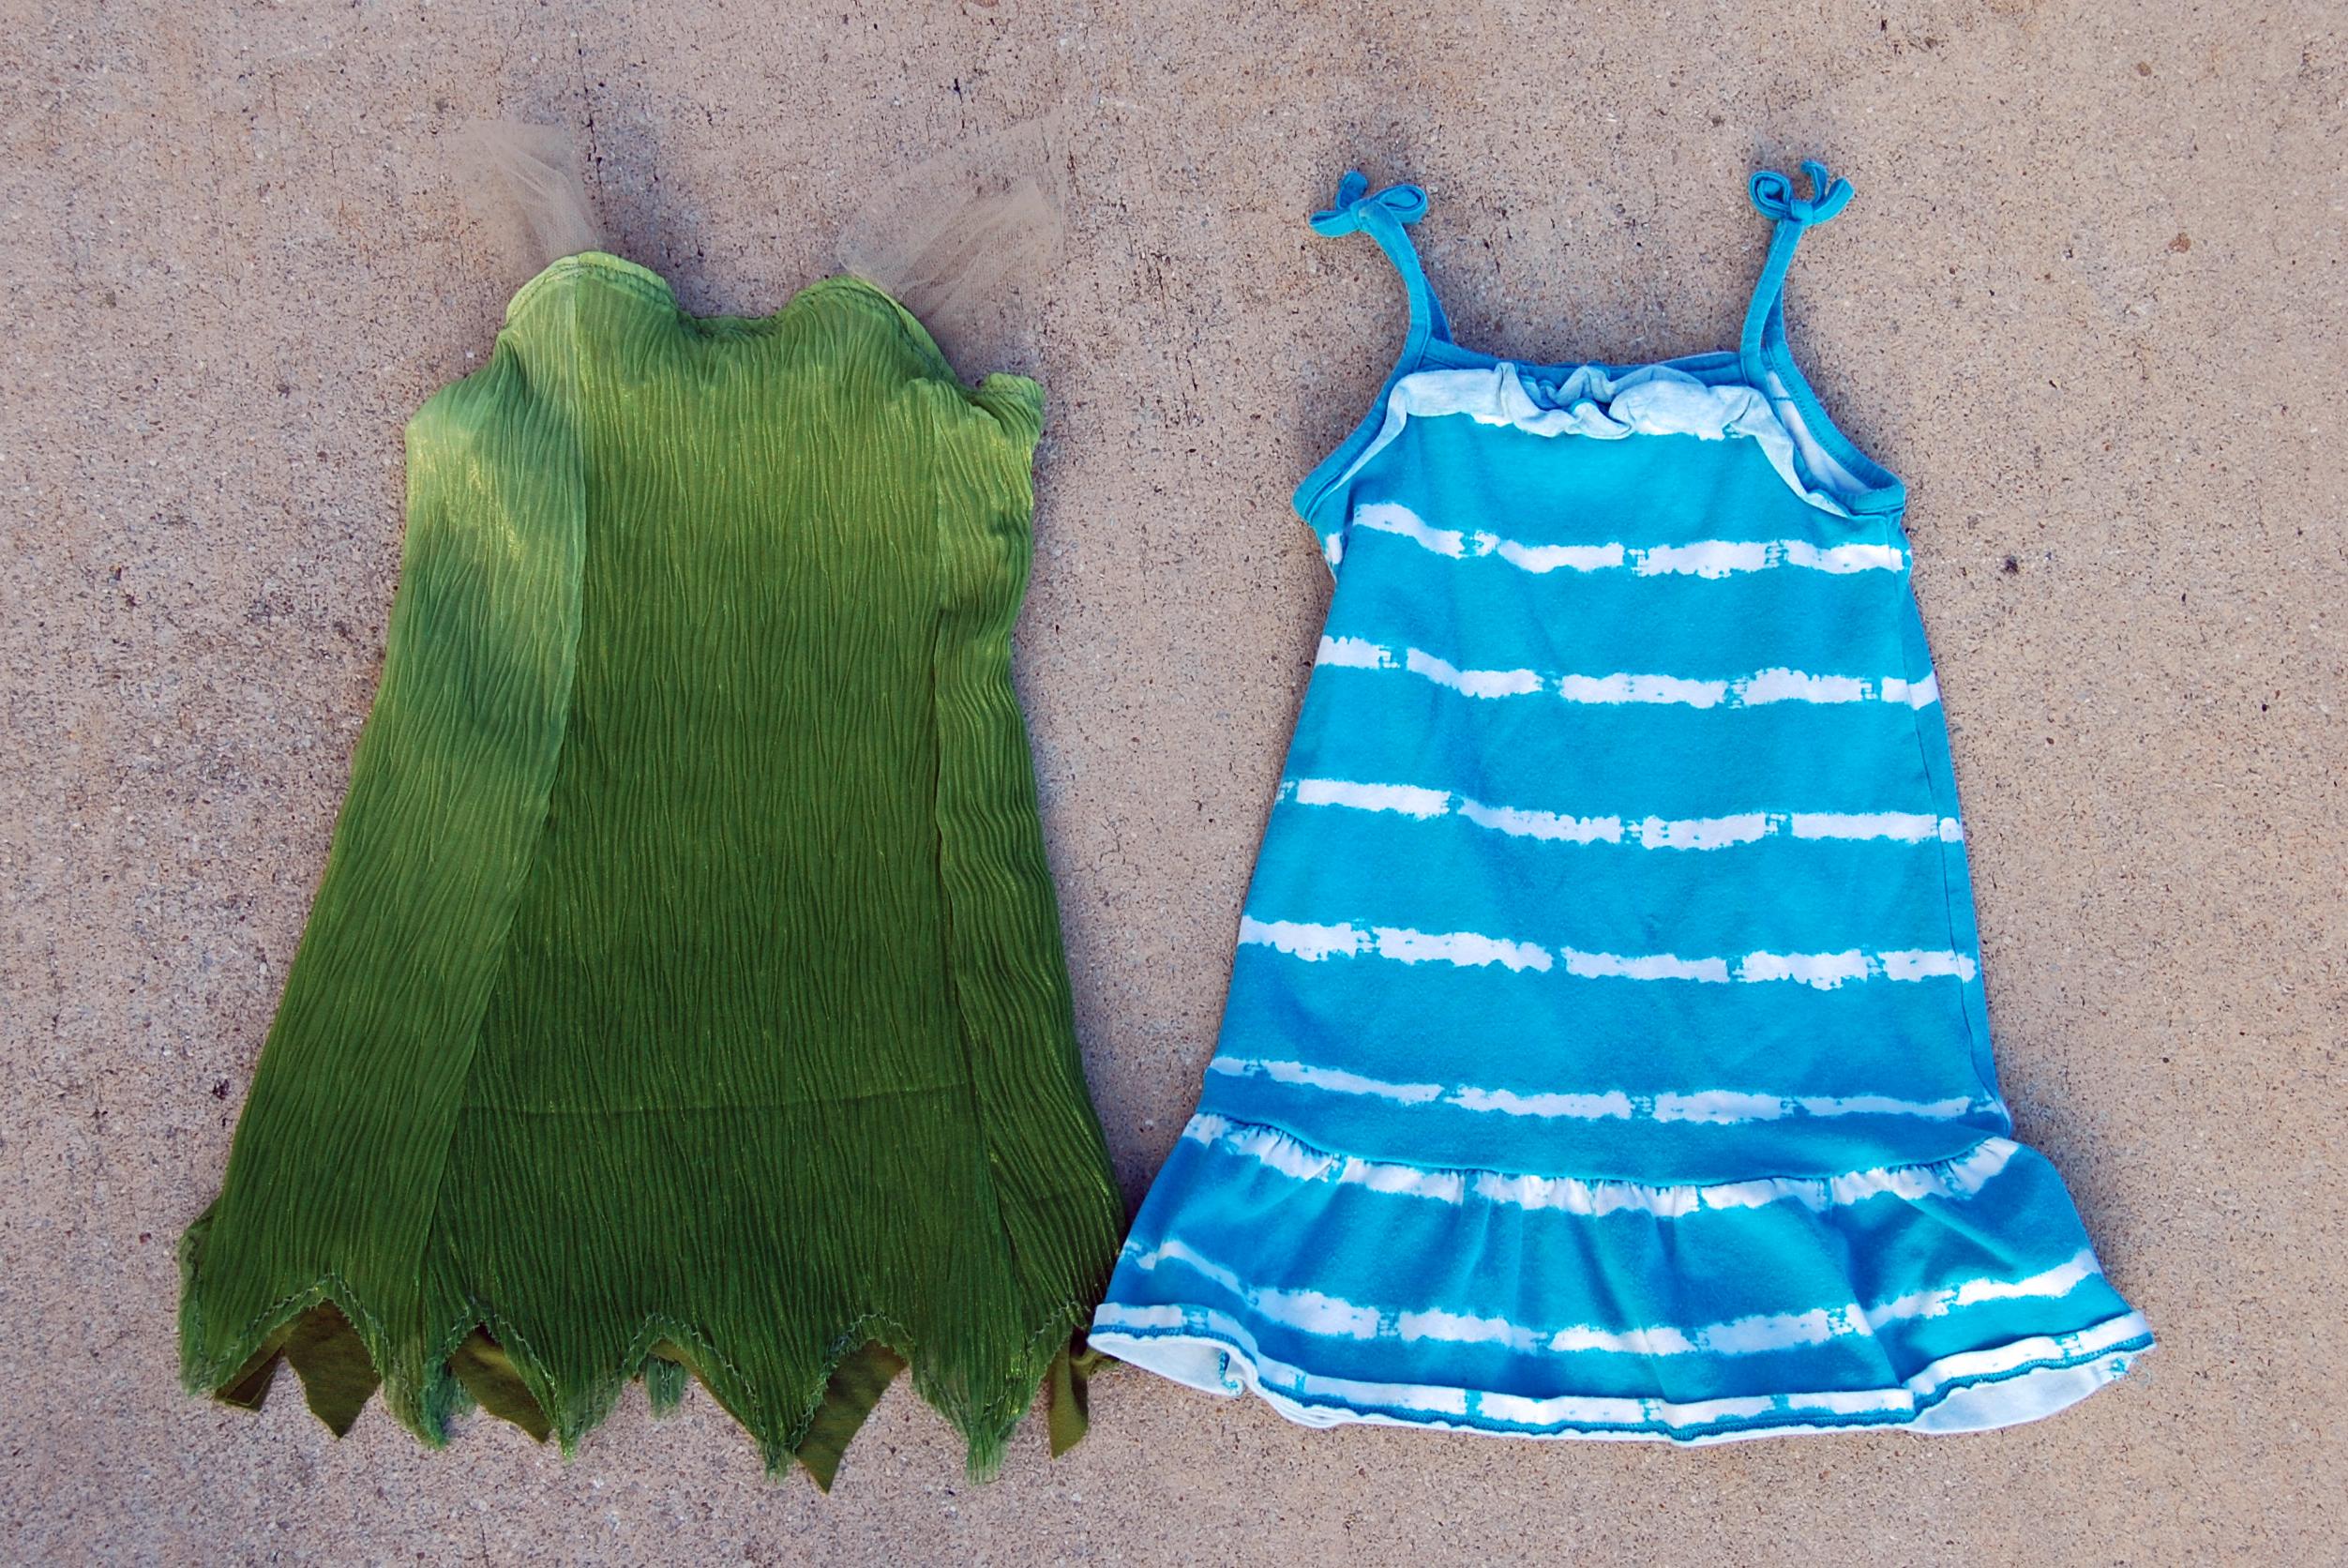 tinkerbell dress sized from sun dress & DIY Tinkerbell Costume -